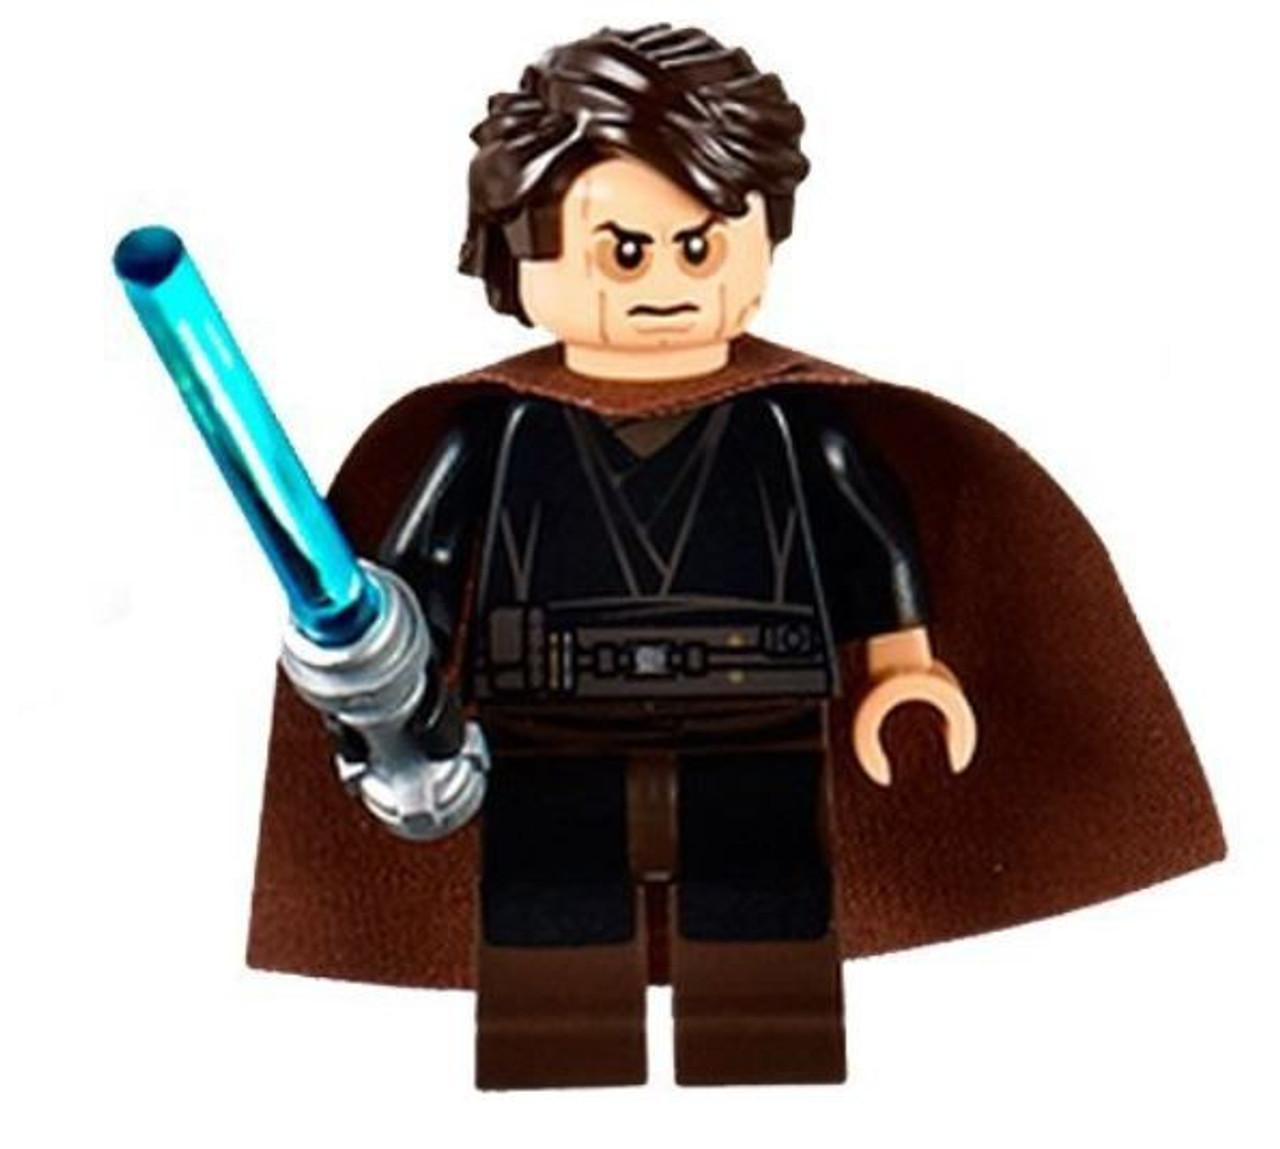 Lego Star Wars Episode 3 Anakin Skywalker Minifigure Sith Face Cape Loose Toywiz